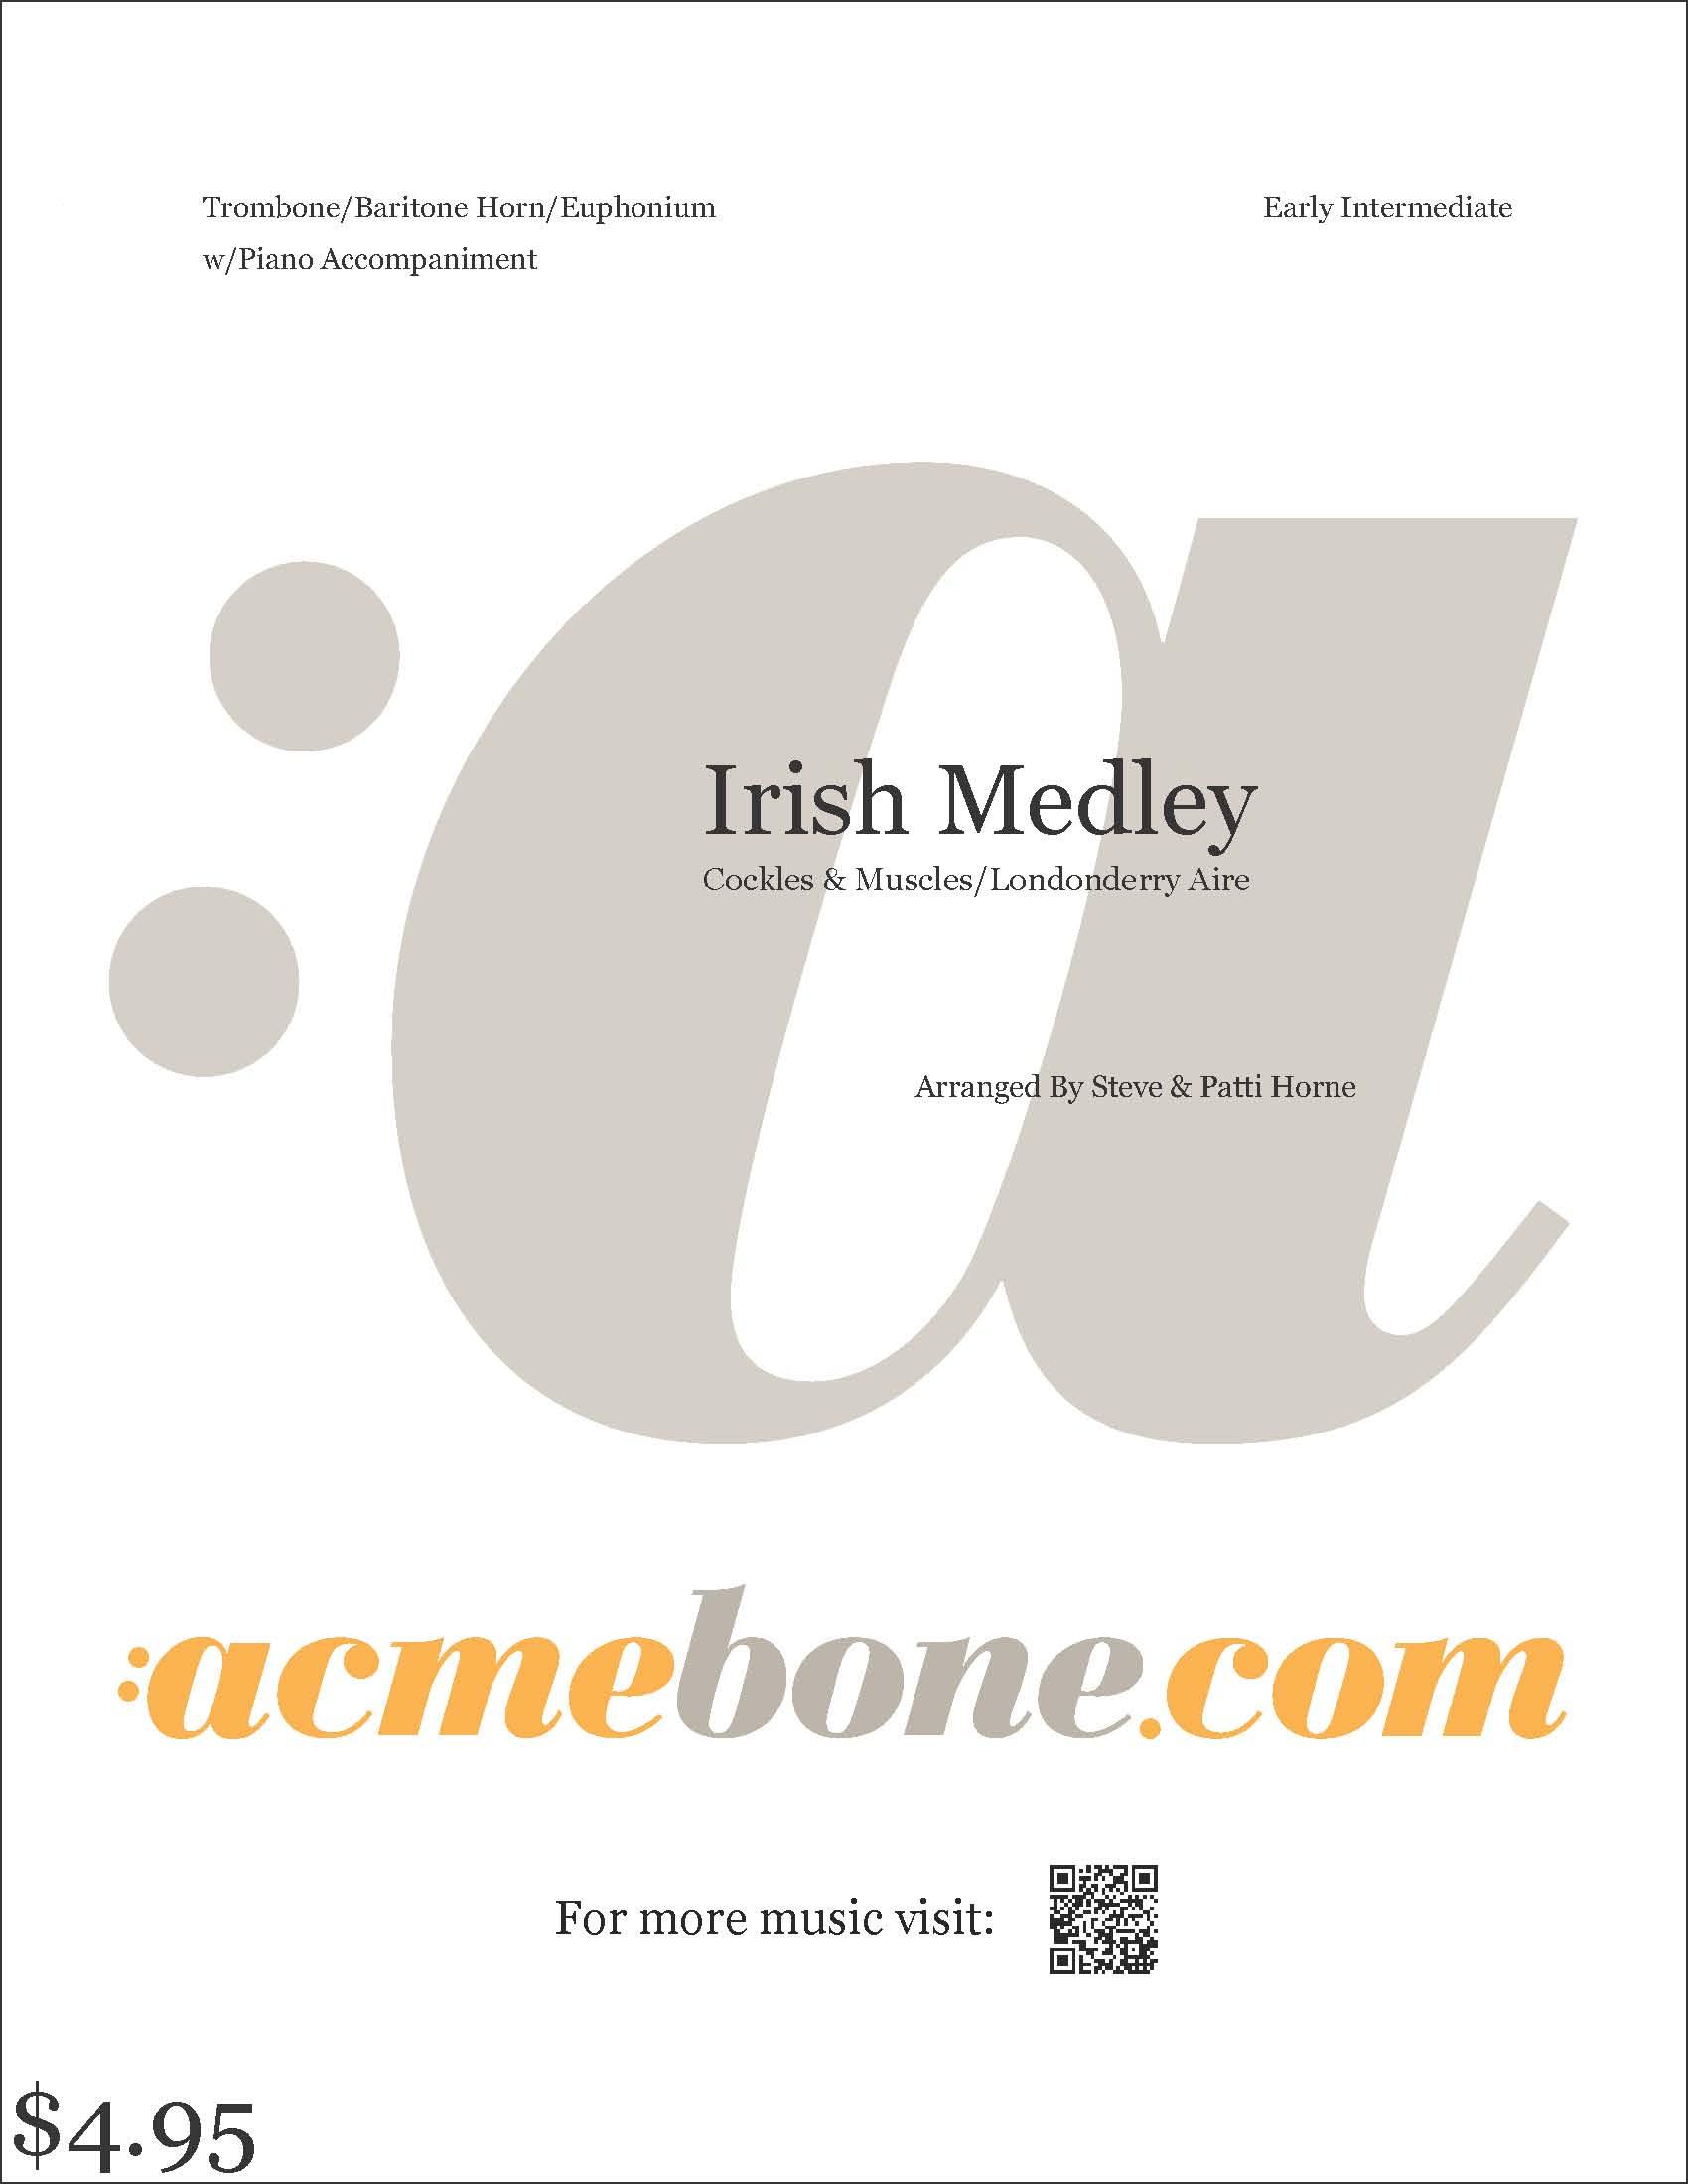 Irish Medley_digital_cover_w-bo_price.jpg